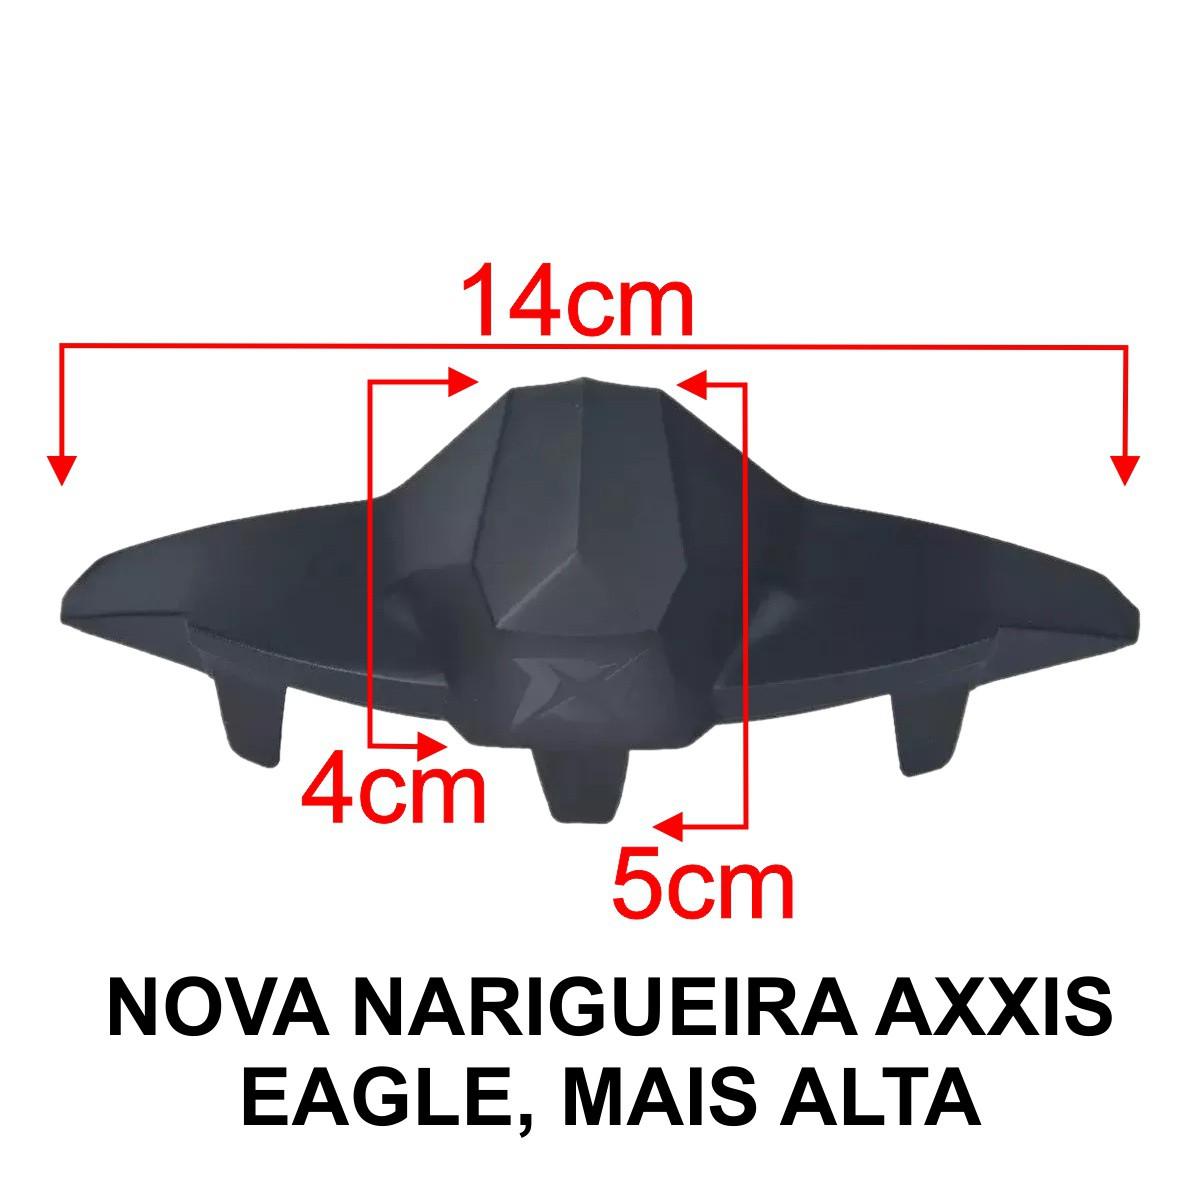 KIT VISEIRA AXXIS EAGLE AZUL V18 + NARIGUEIRA NEW ALTA